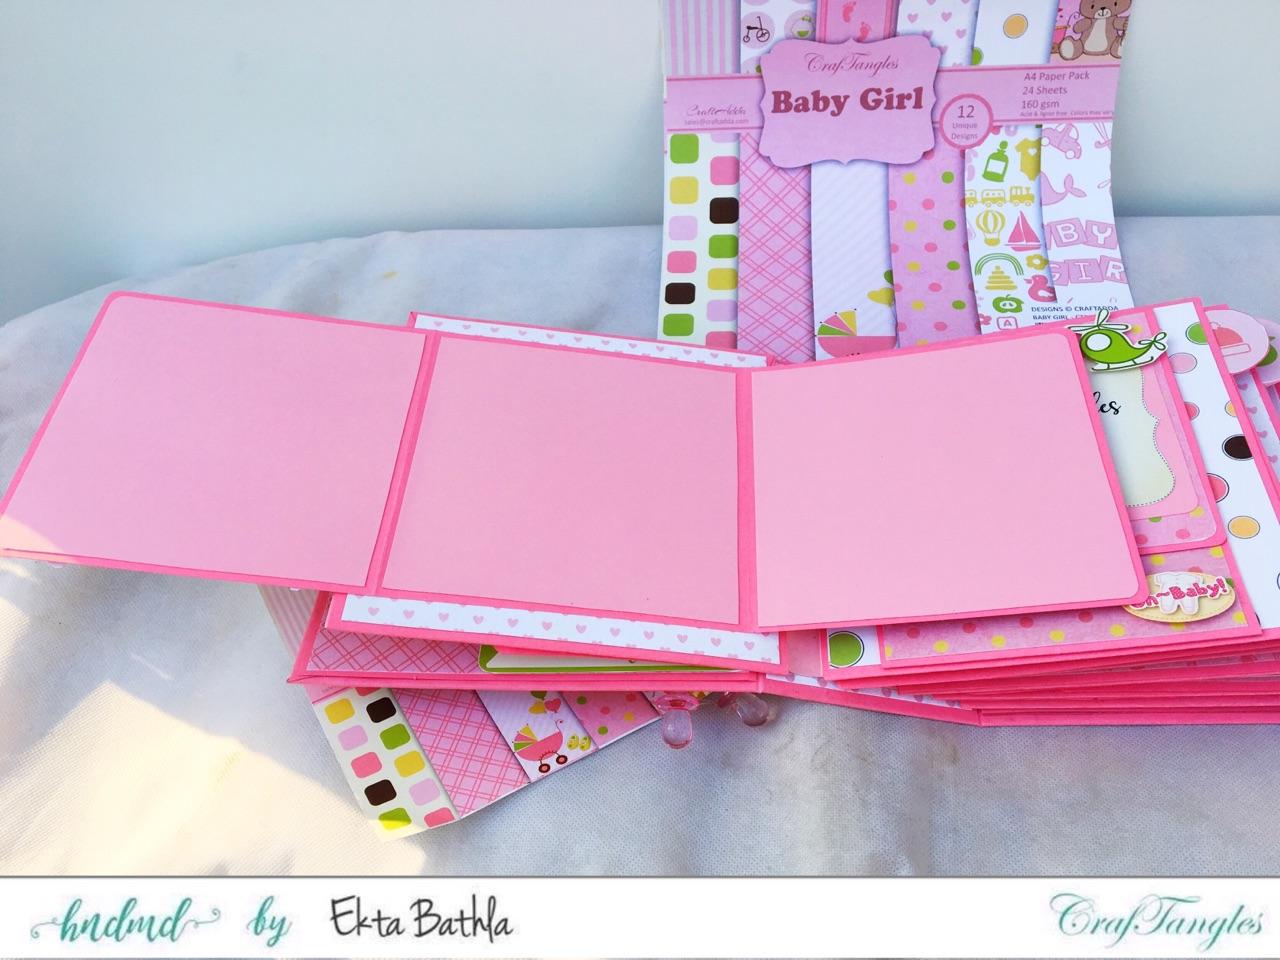 Baby Girl mini album showcasing Baby Girl Elements Pack by CrafTangles 6